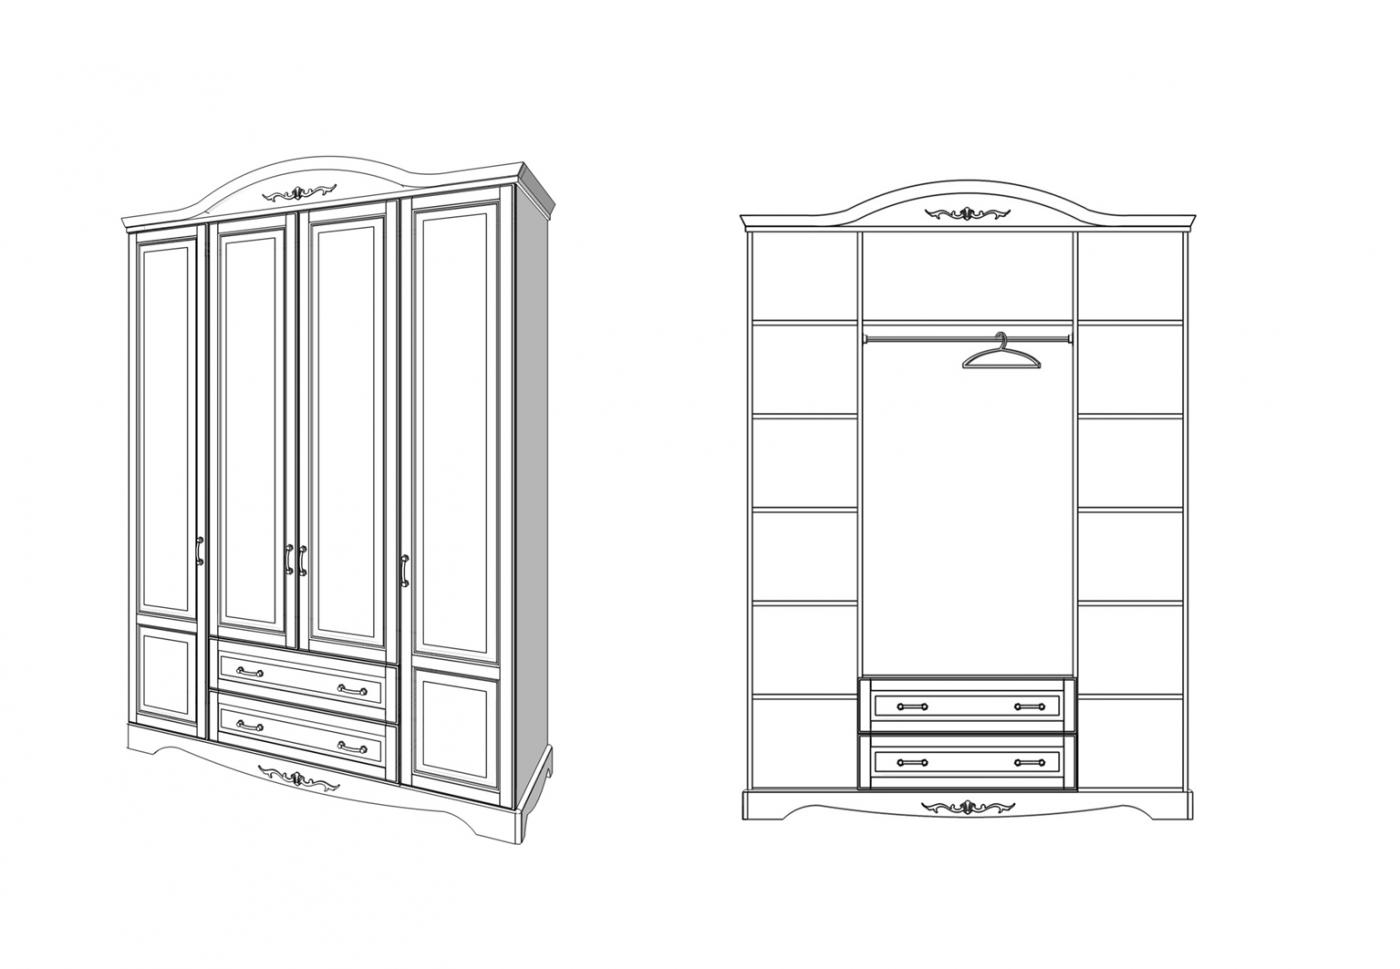 Шкаф Прованс 4 двери 2 ящика2